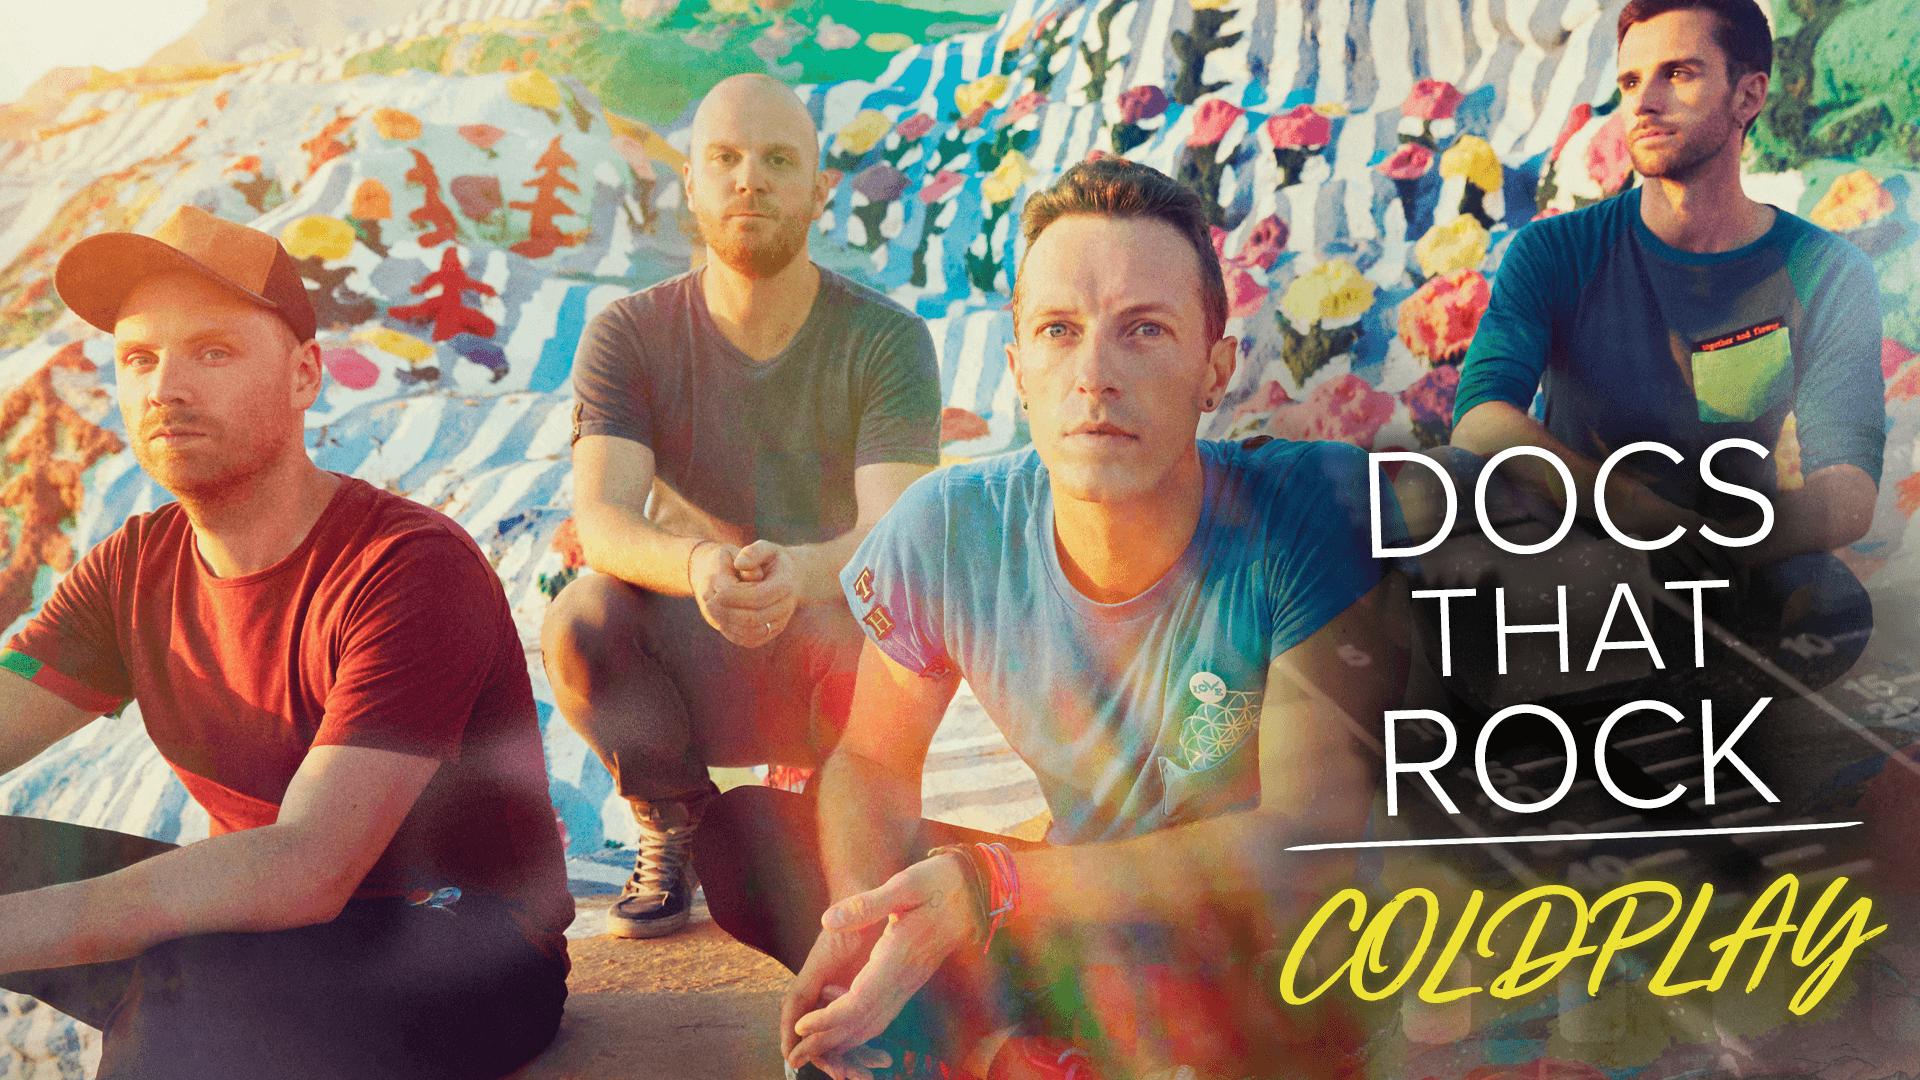 Coldplay - A Head Full of Dreams Trailer | Docs That Rock